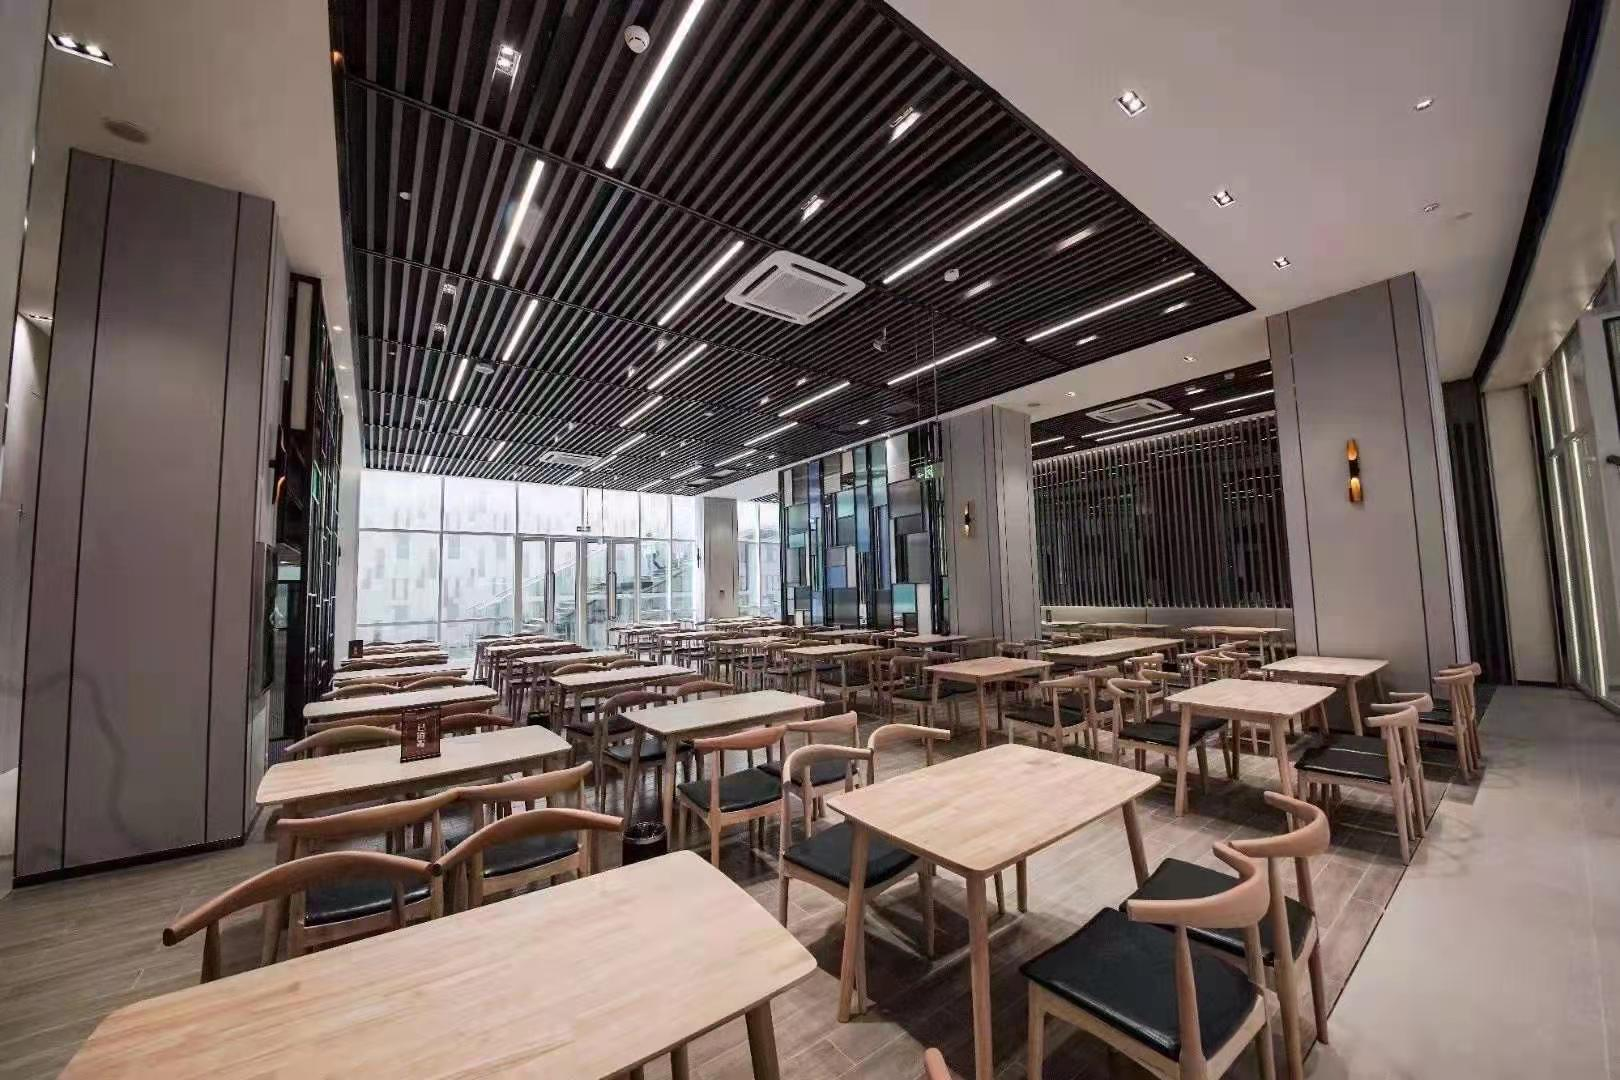 成都爱奇艺创新大厦-食堂